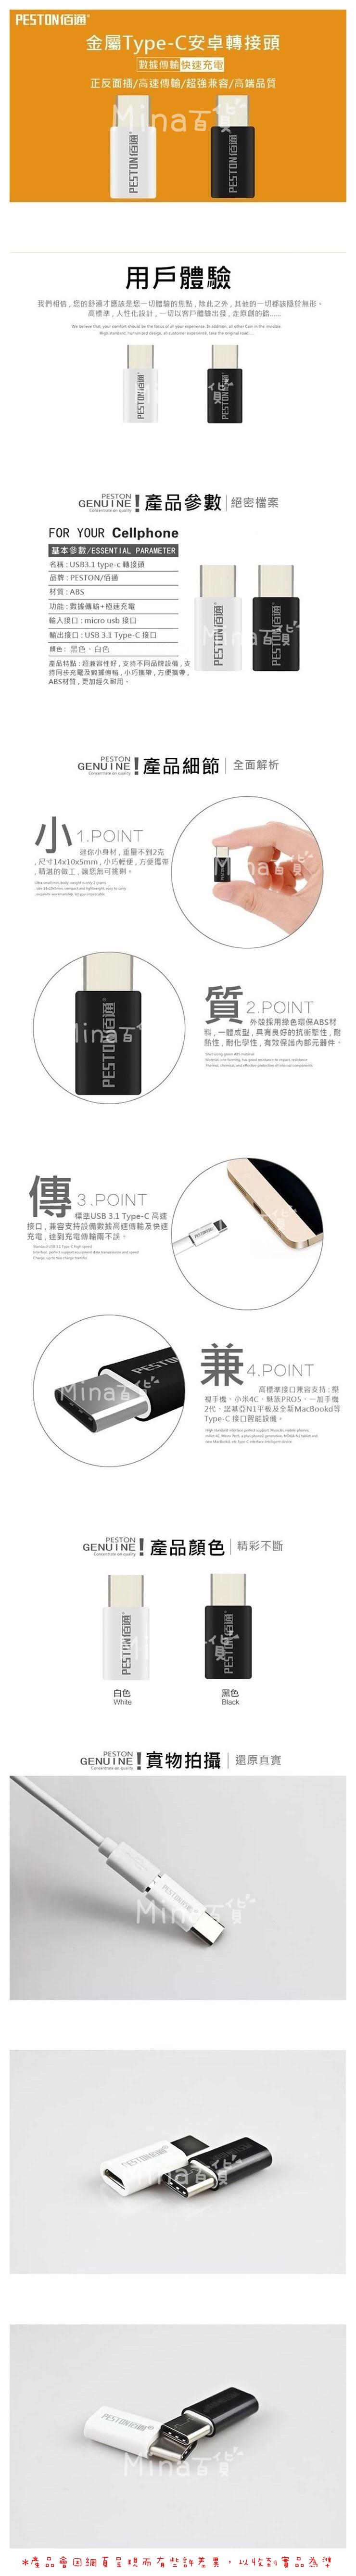 C0064 手機數據線 長圖(有mina)